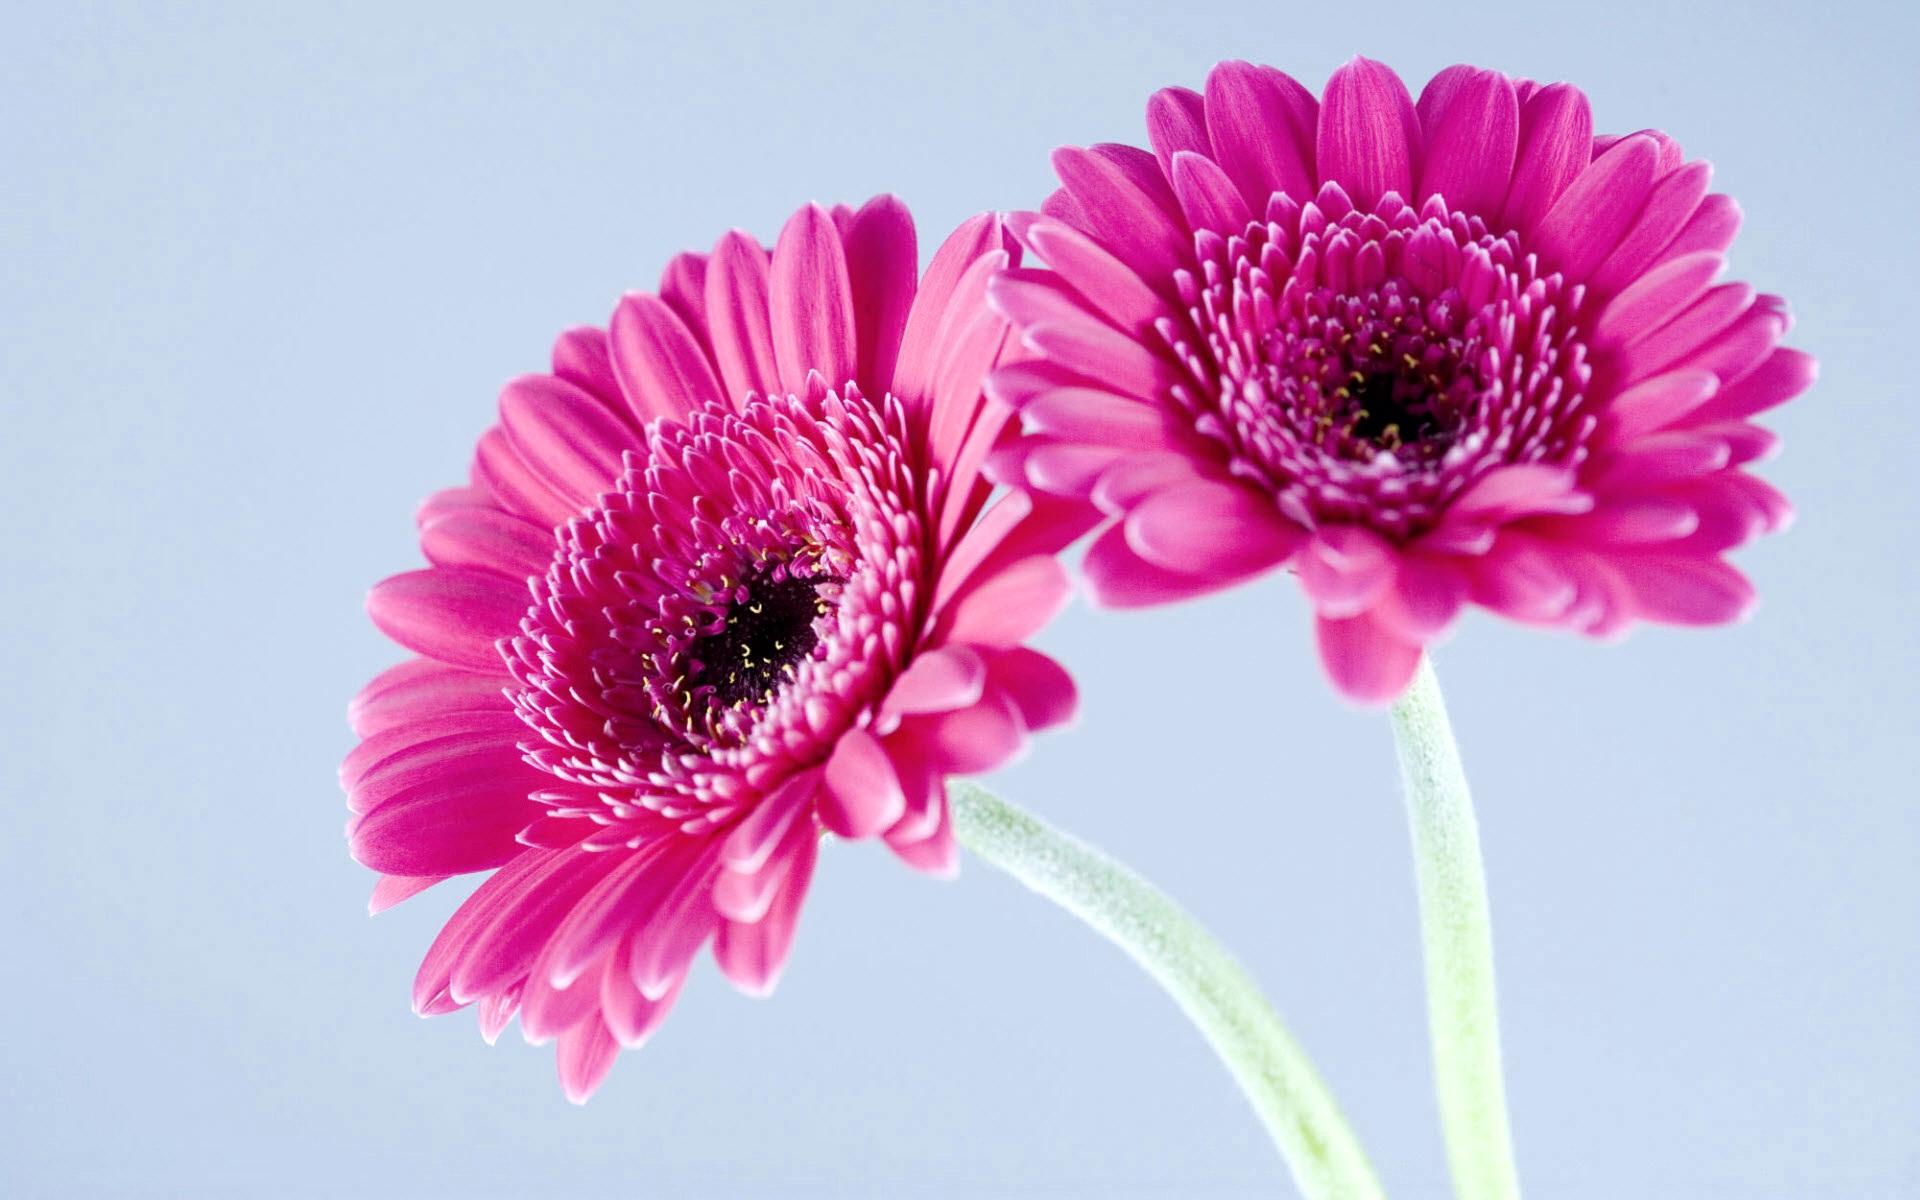 pink gerbera flower image